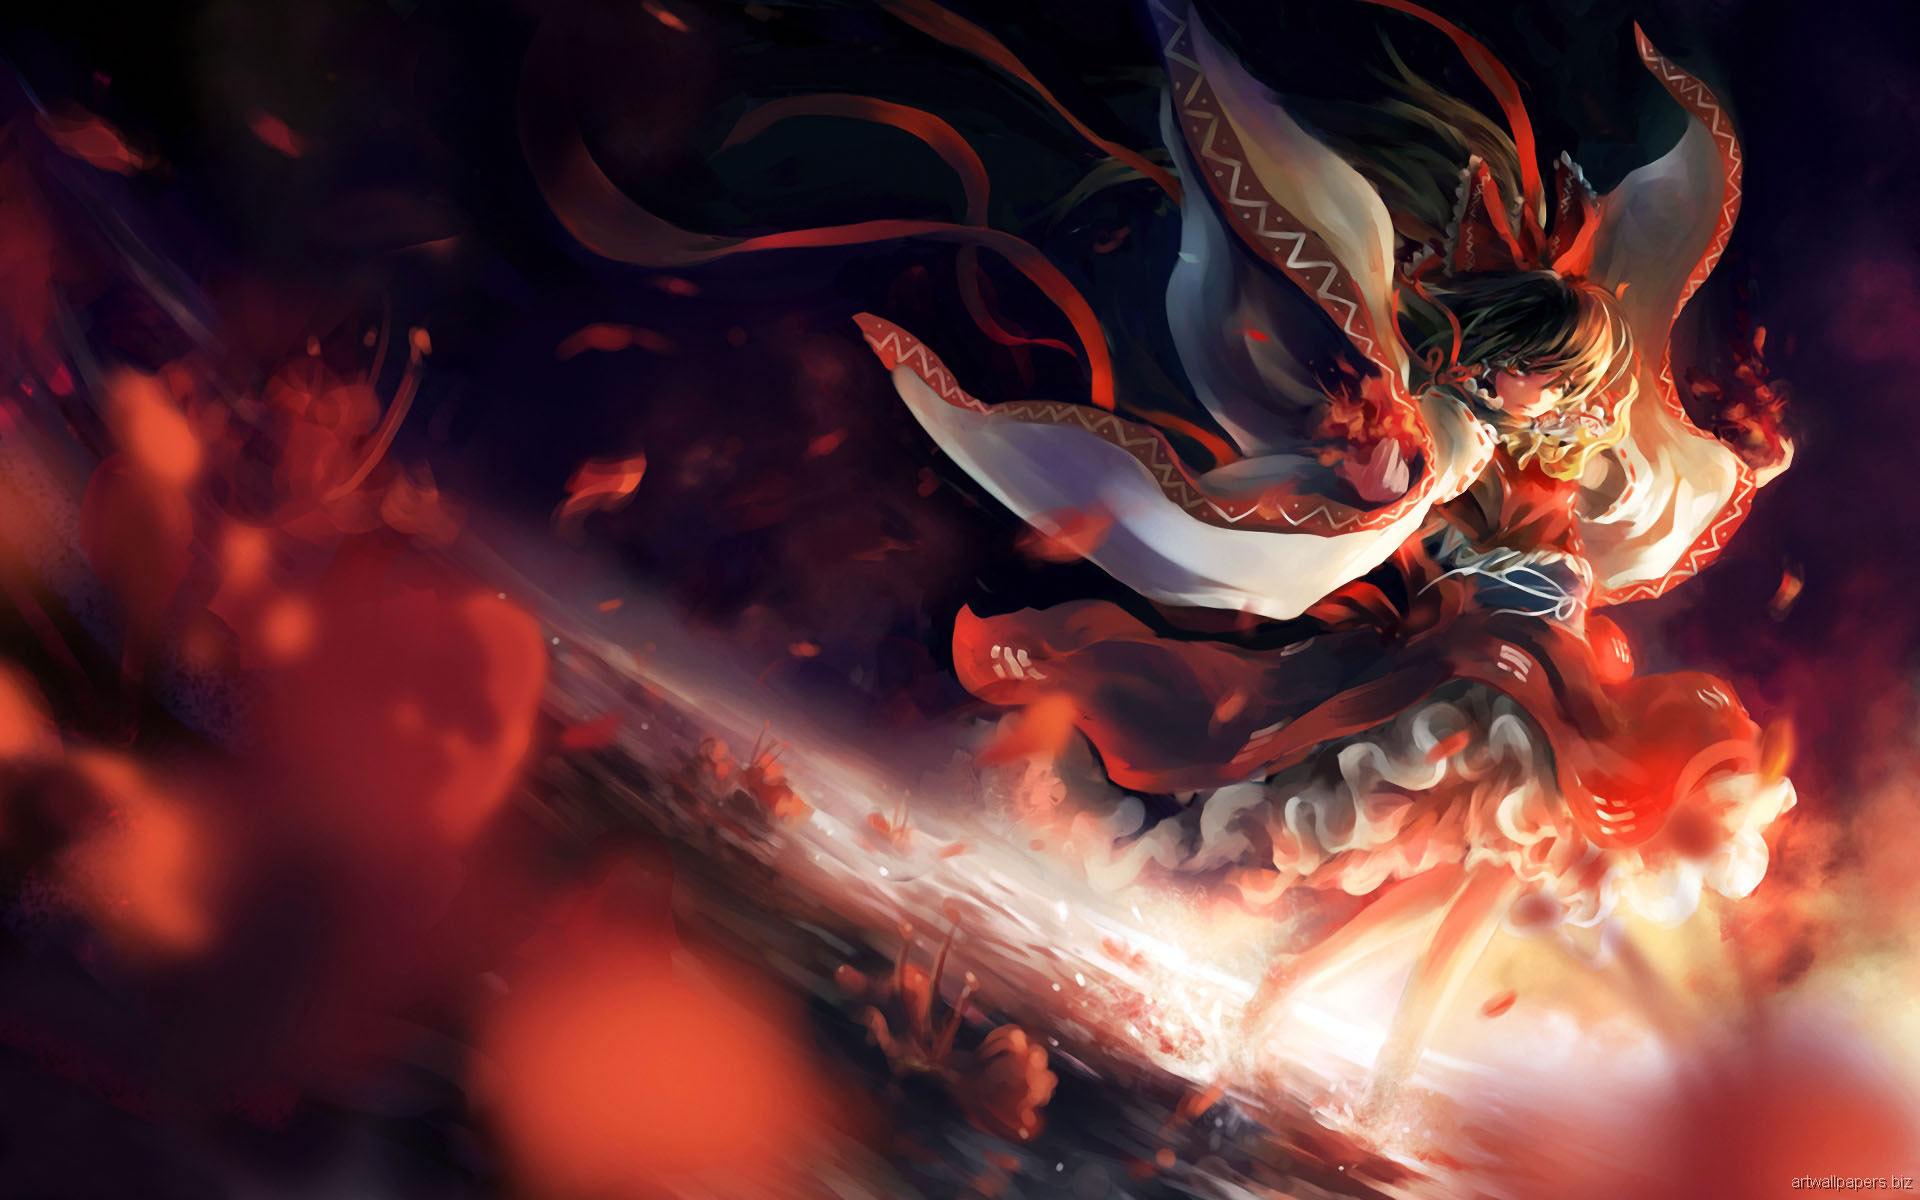 Beautiful anime wallpapers stress effect - Foto anime keren hd ...